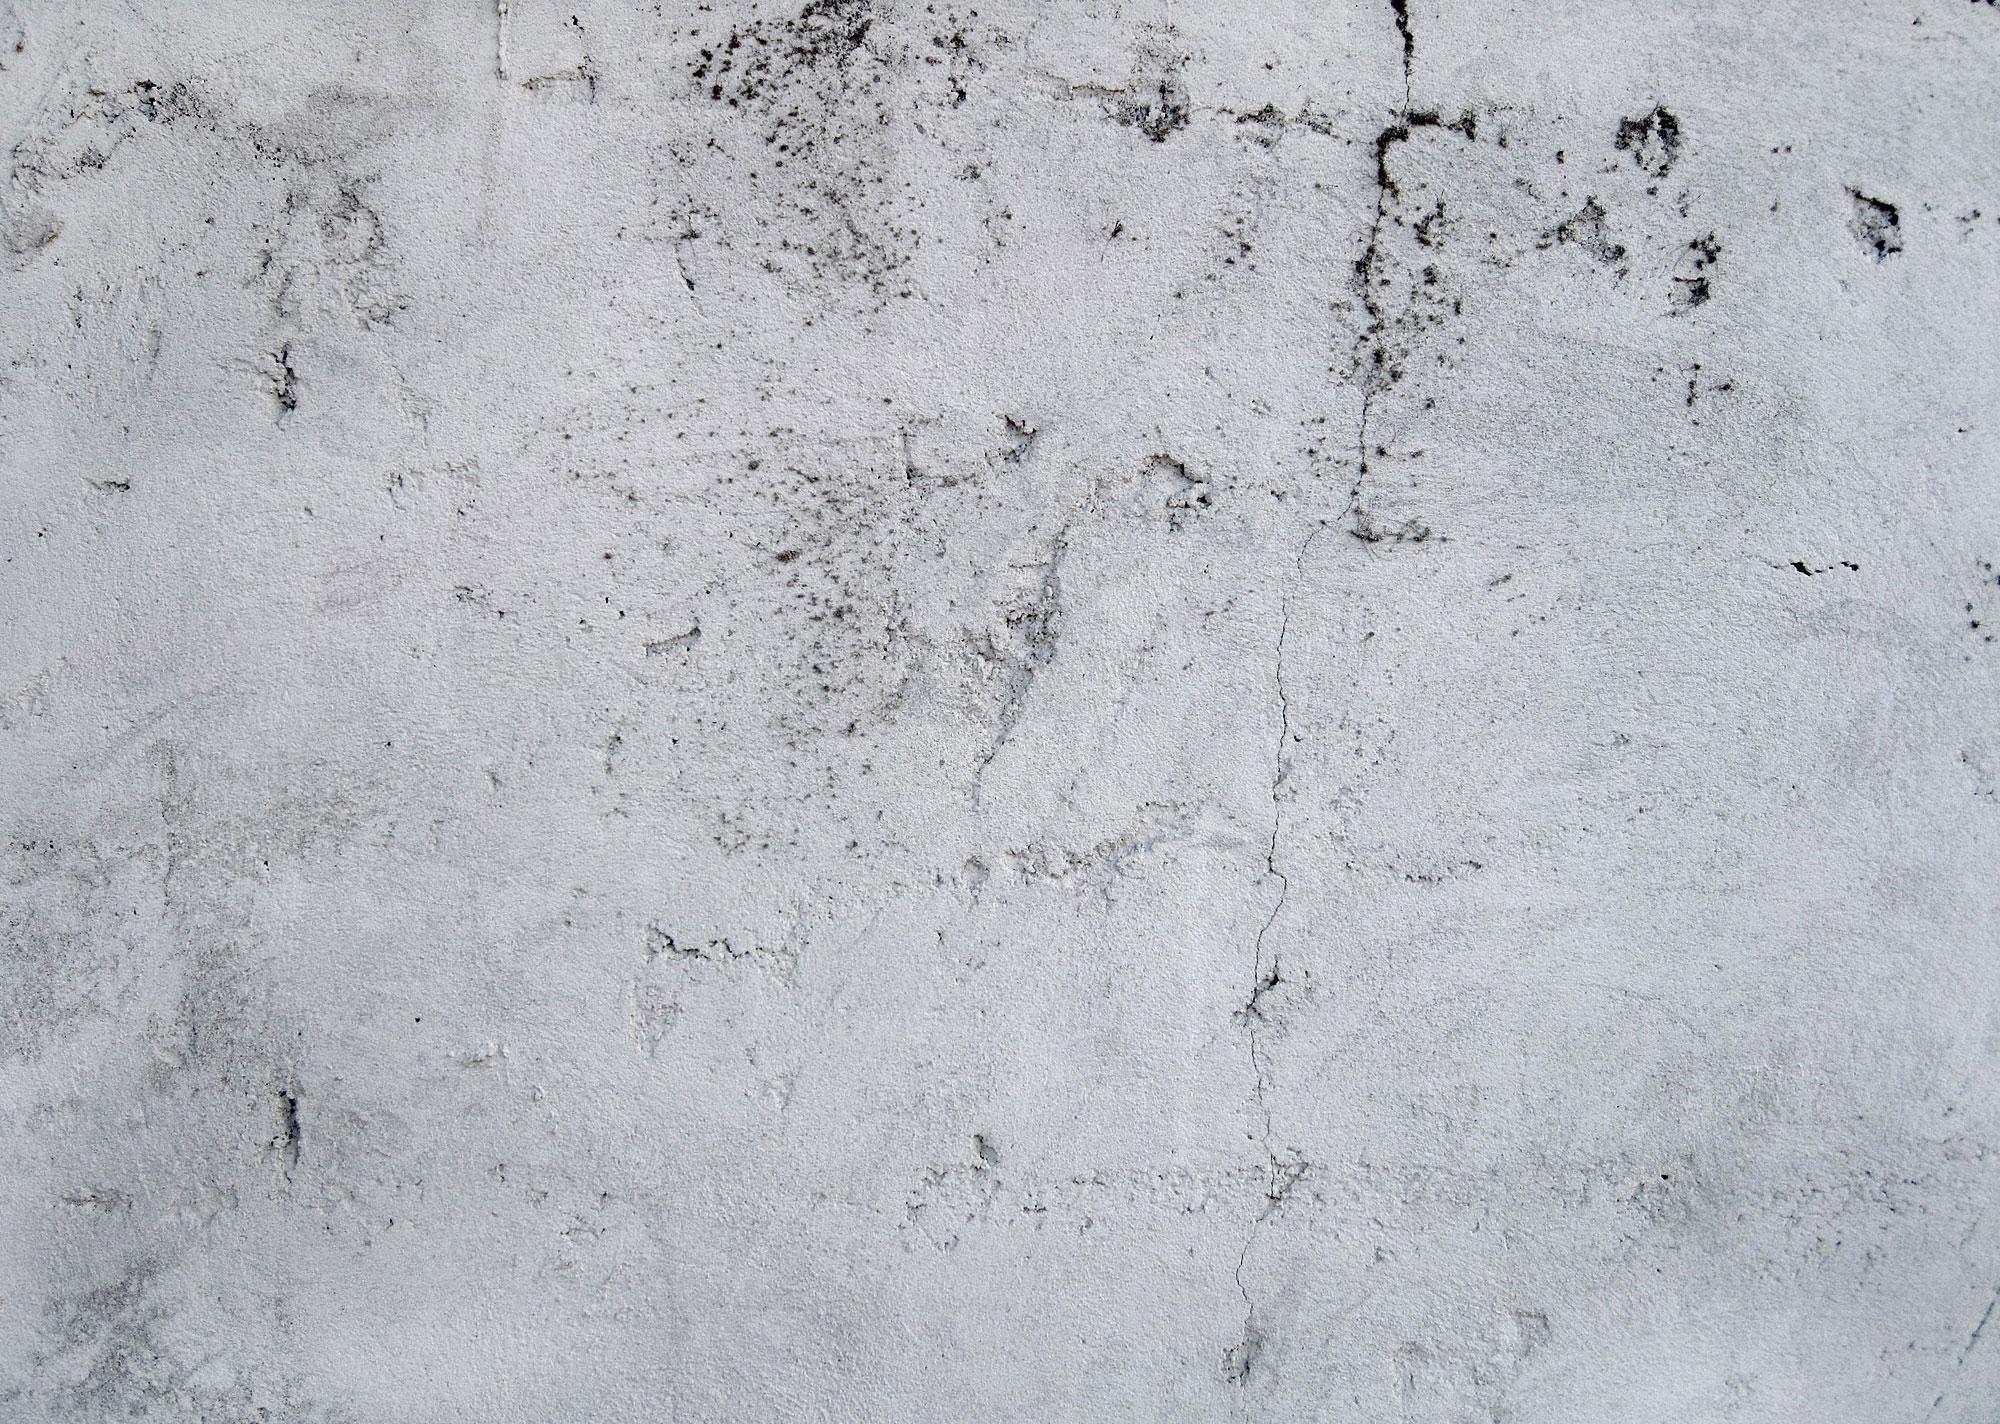 White Wall Texture Cracks Grunge Desktop Wallpaper